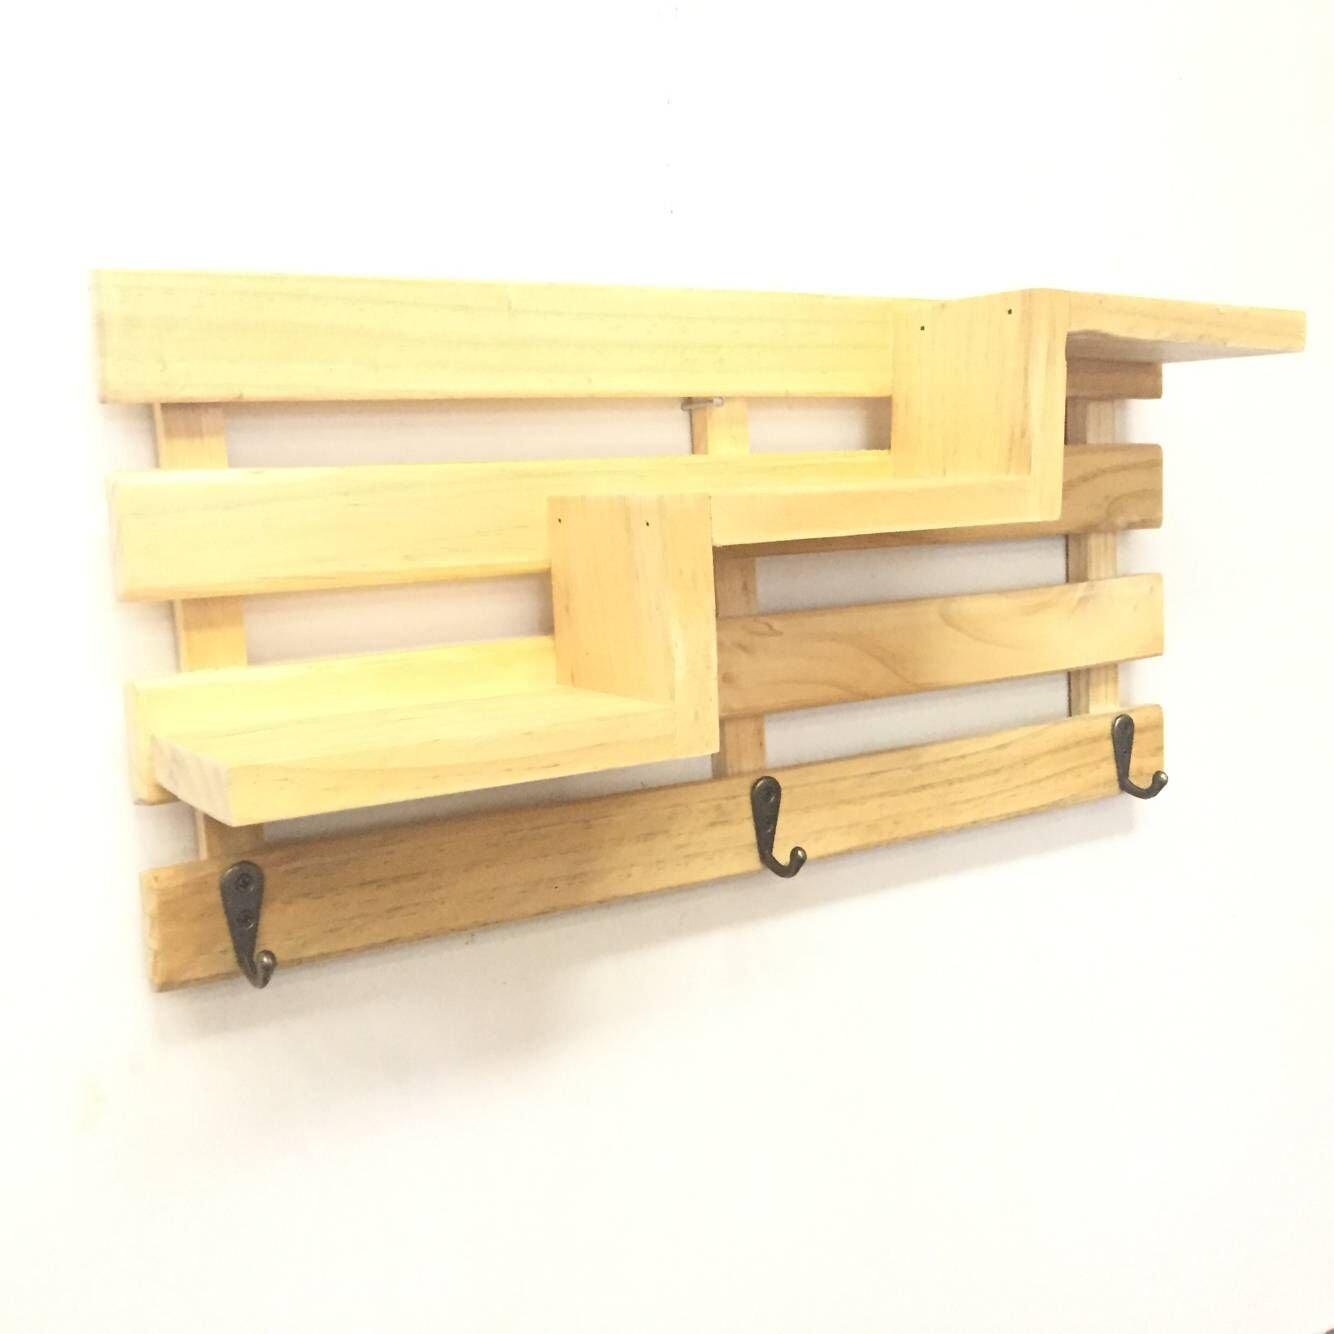 Amazon.com: Rustic Key Holder Rustic Wall Decor, Natural Wood Key ...